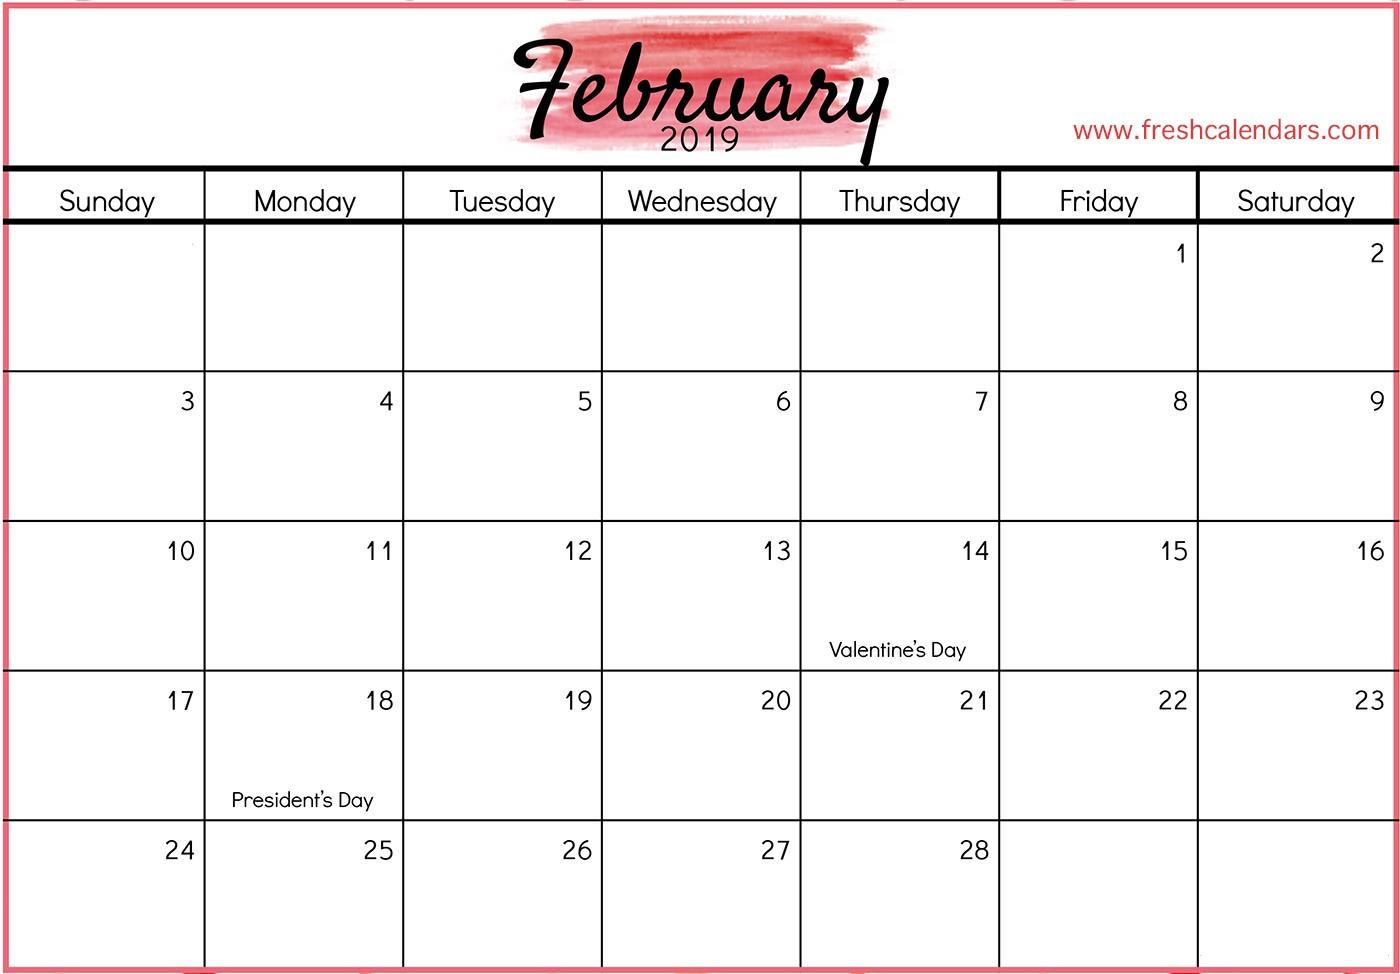 February 2019 Printable Calendar with Holidays